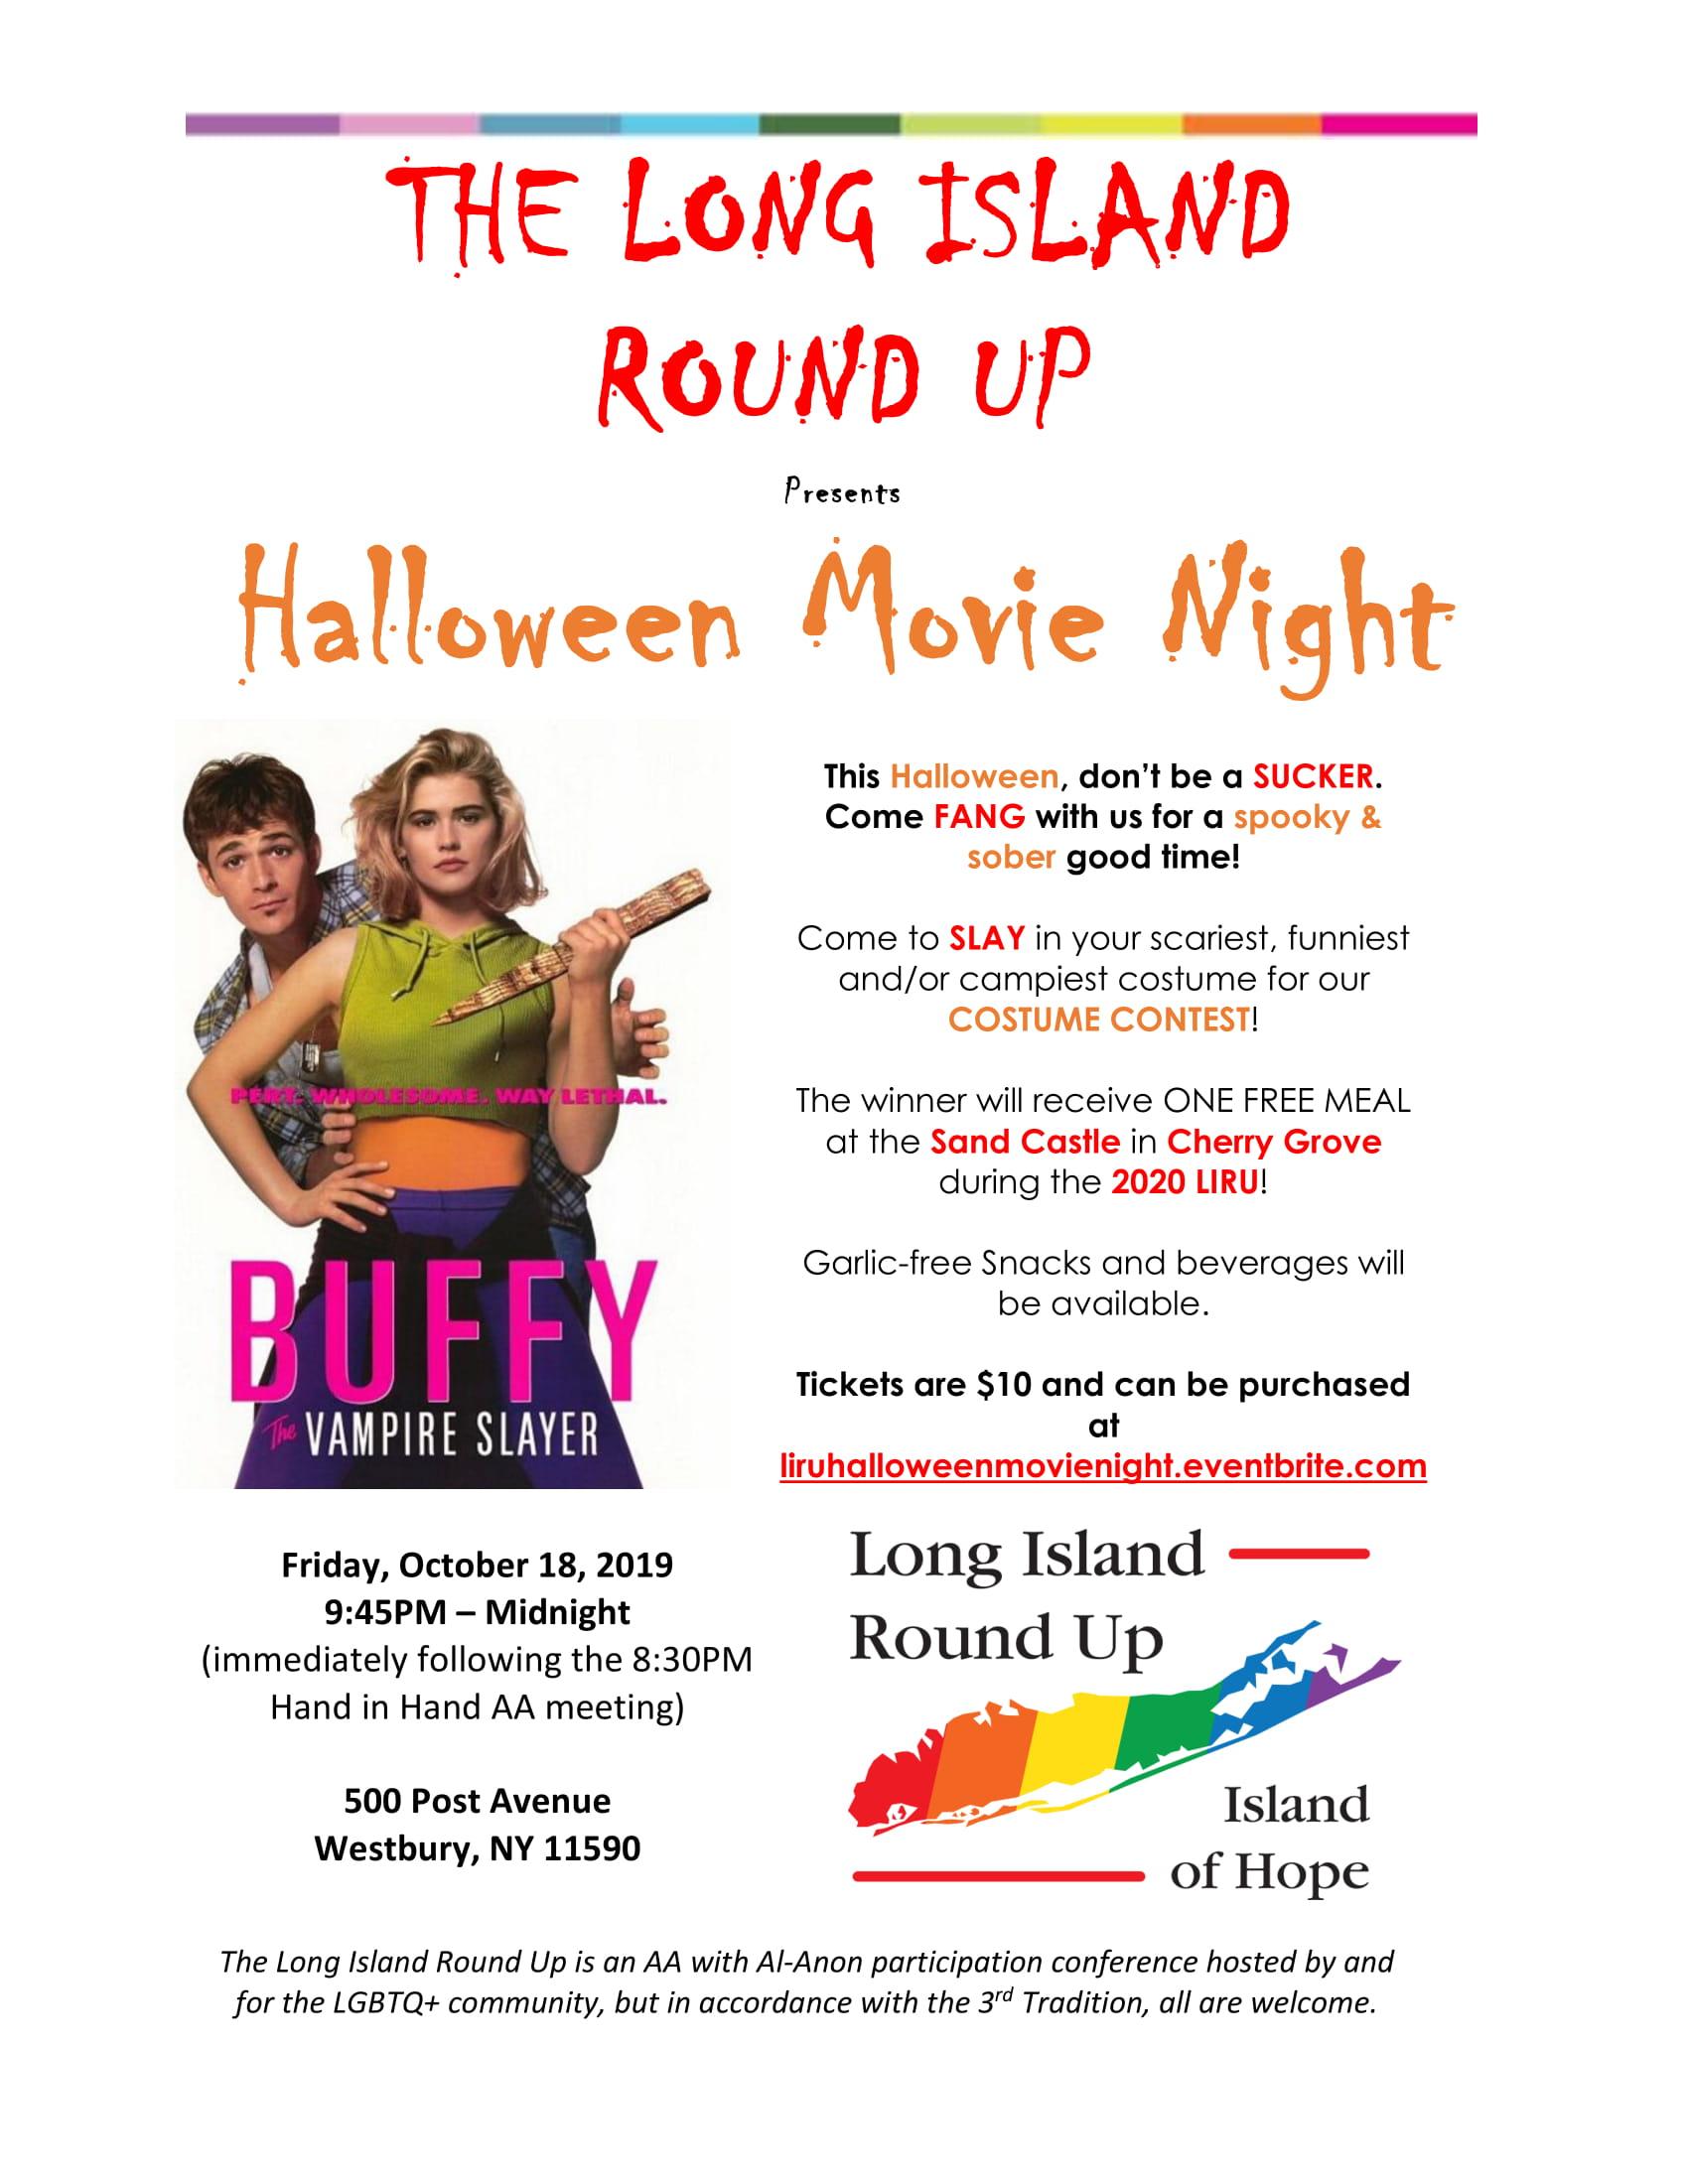 LIRU 2019 Halloween Movie Night Flyer-1.jpg